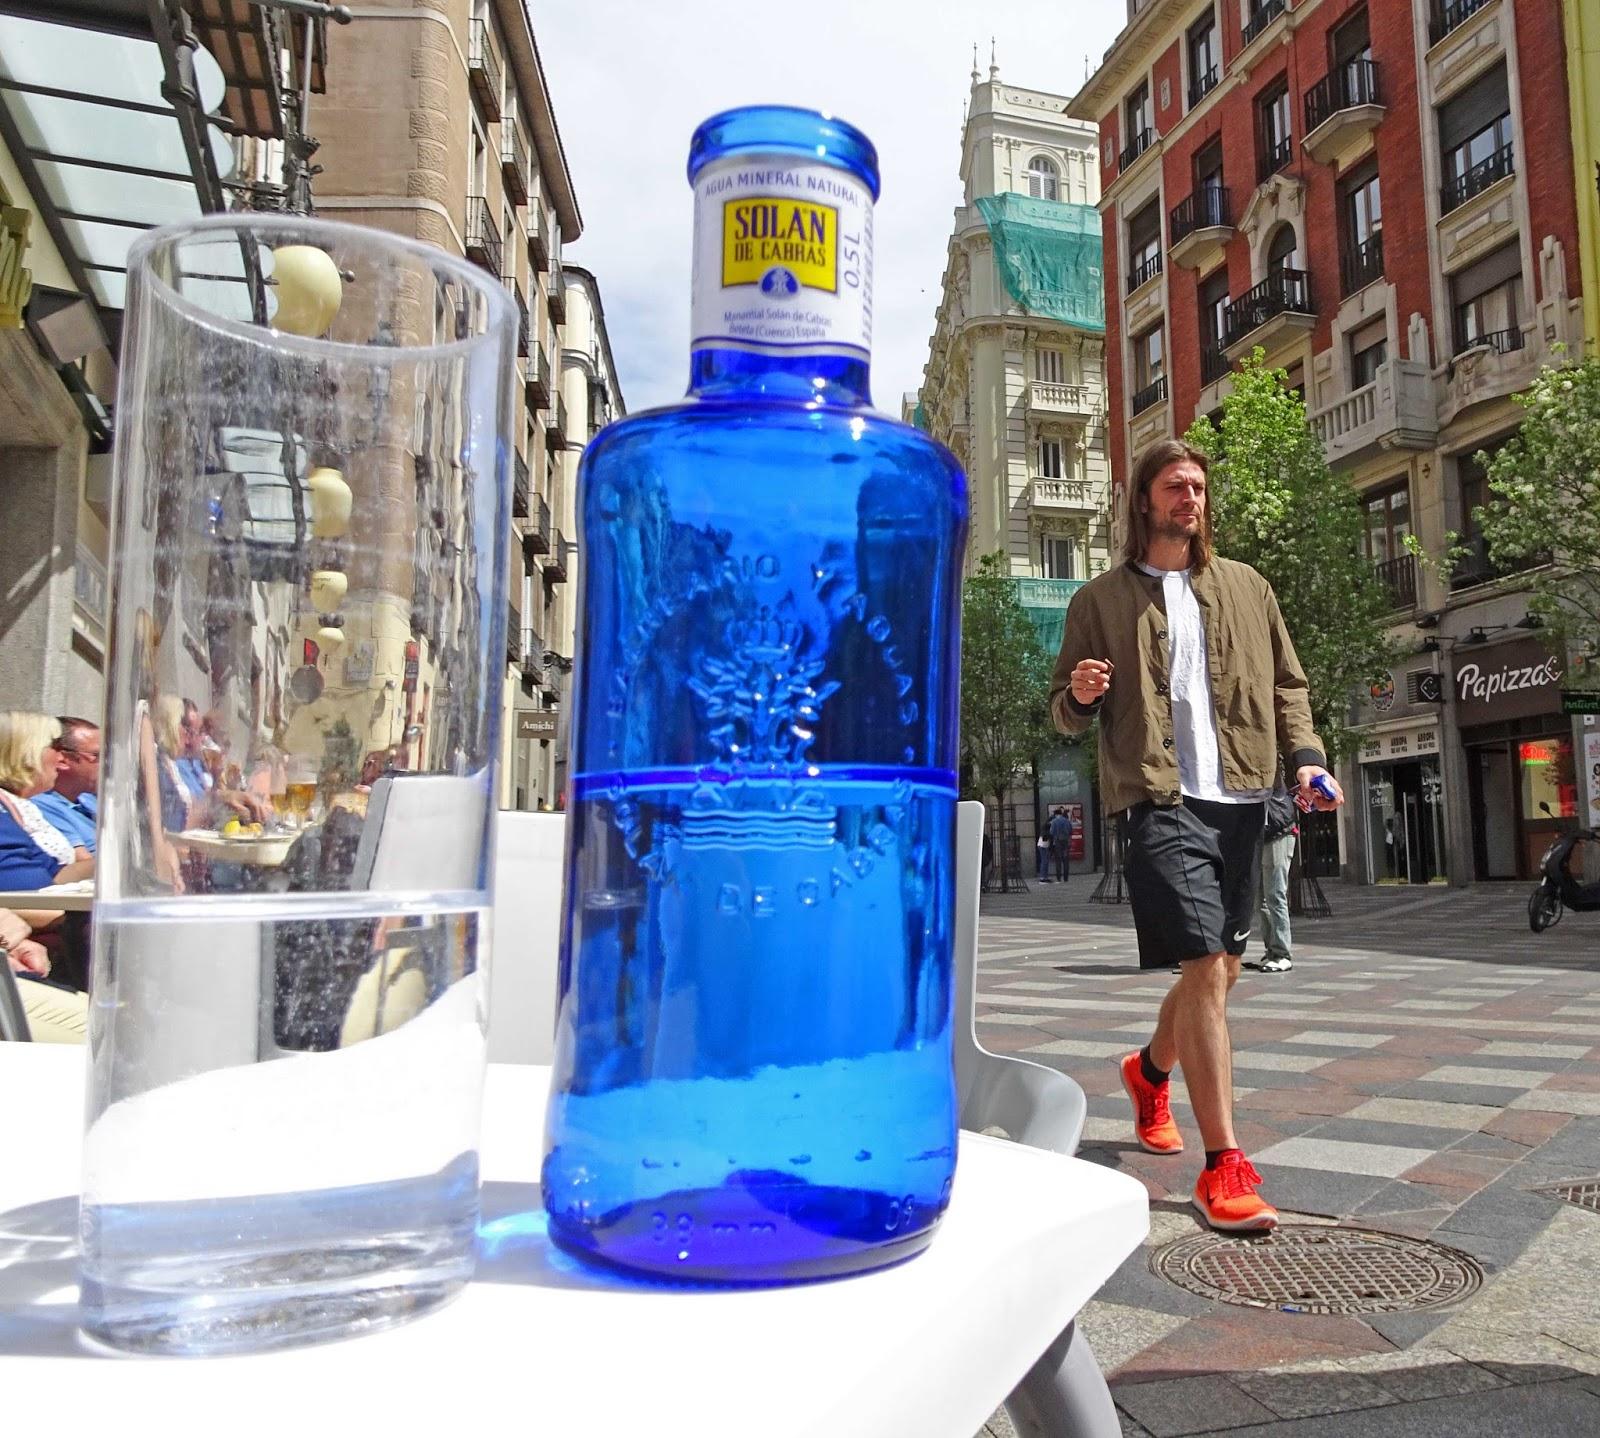 Water Bottle In Spanish: Joe's Retirement Blog: Shades Of Blue, Centro, Madrid, Spain